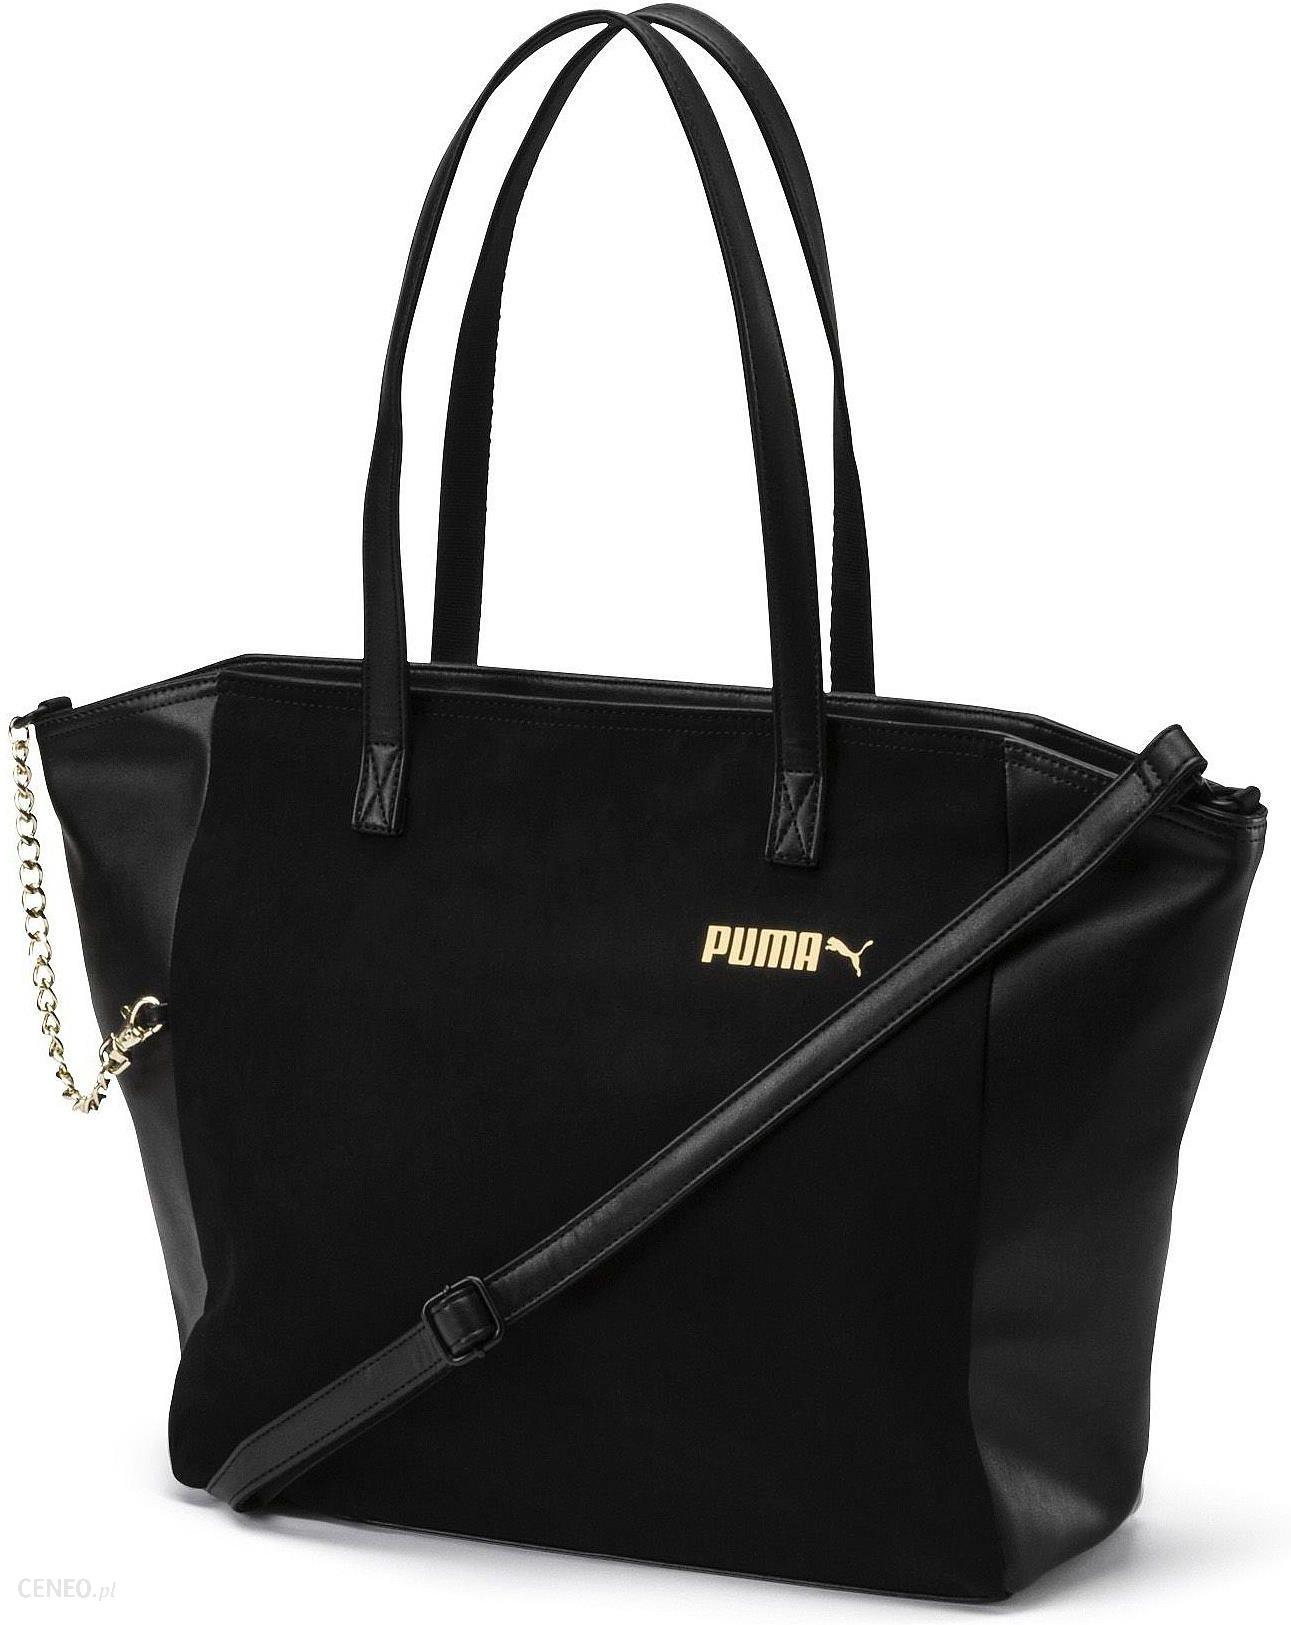 25e6e5ed566a9 torba Puma Prime Premium Large Shopper - Puma Black one size - zdjęcie 1